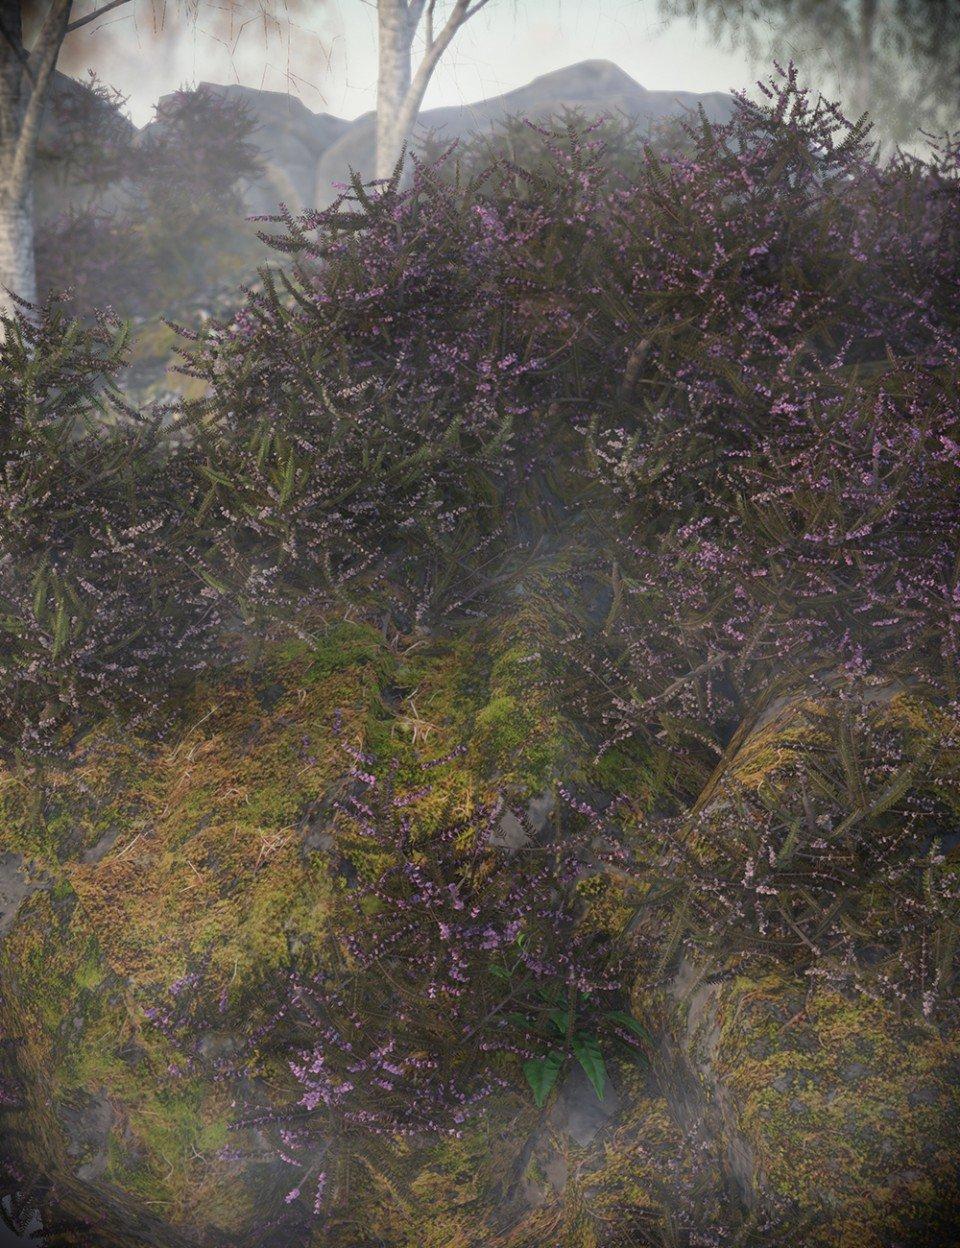 Heather – Heath and Moorland Plants for Daz Studio_DAZ3D下载站